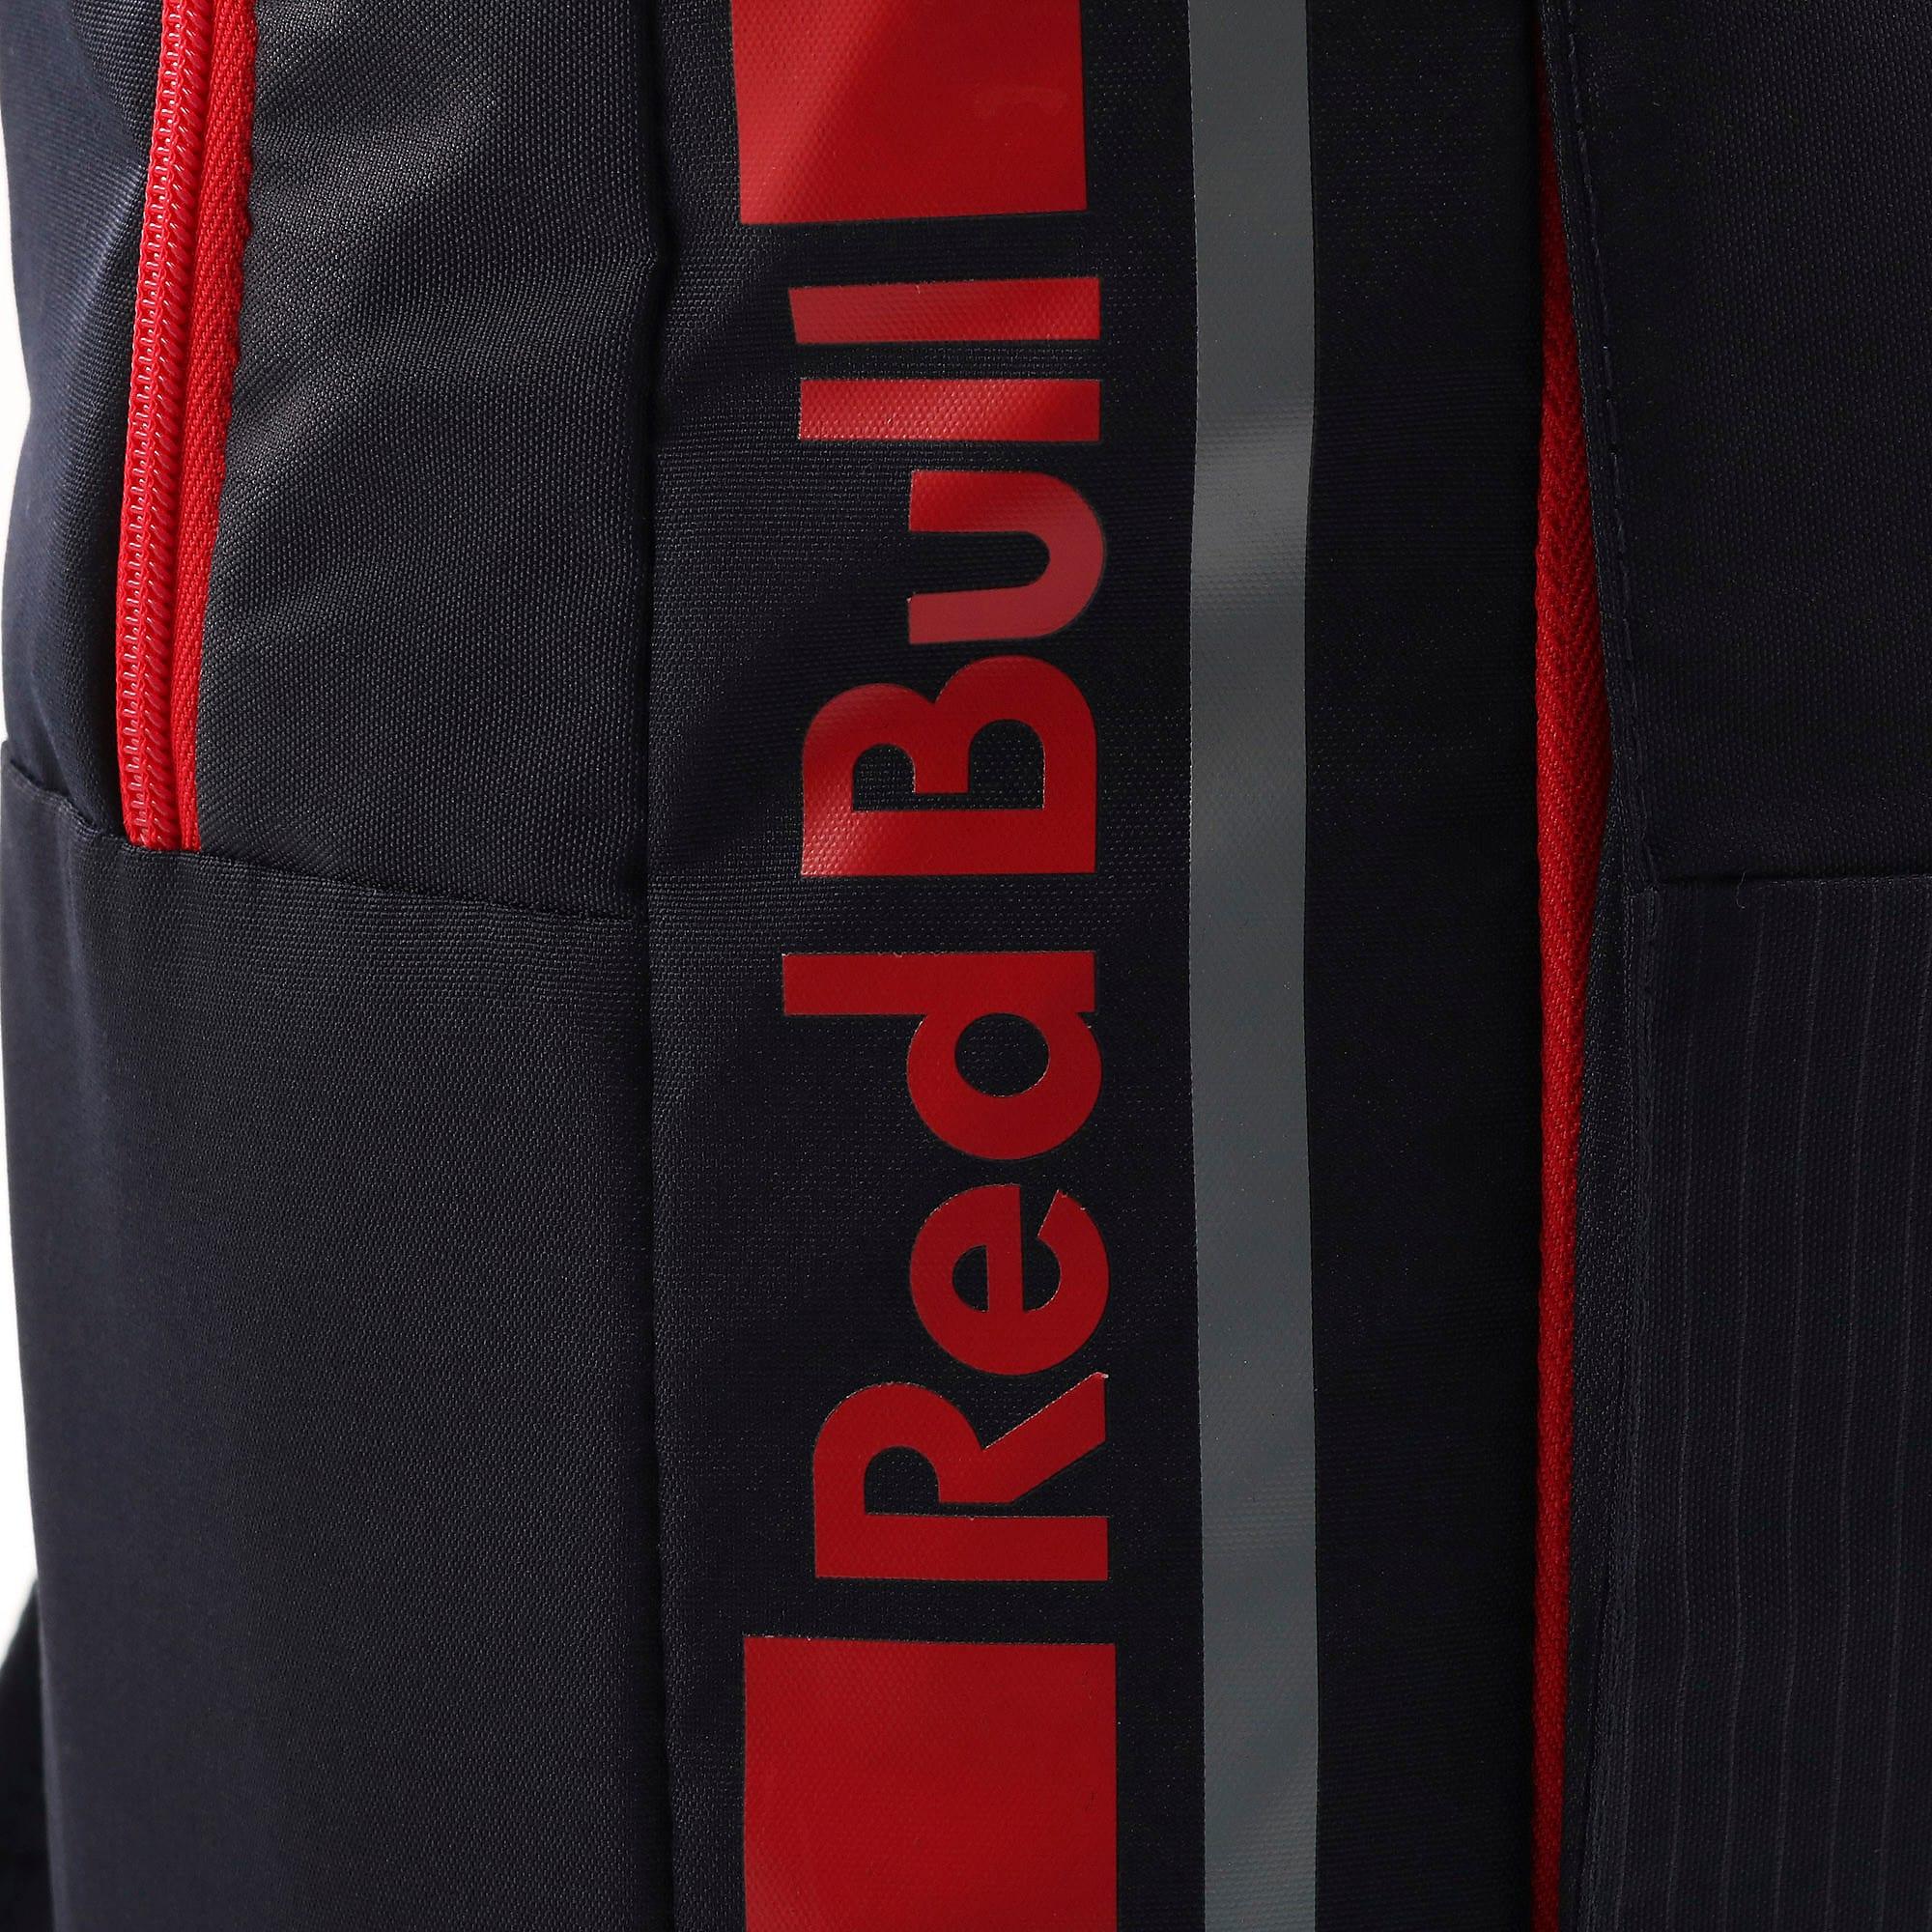 Thumbnail 7 of ASTON MARTIN RED BULL RACING レプリカ バックパック 21L, NIGHT SKY, medium-JPN